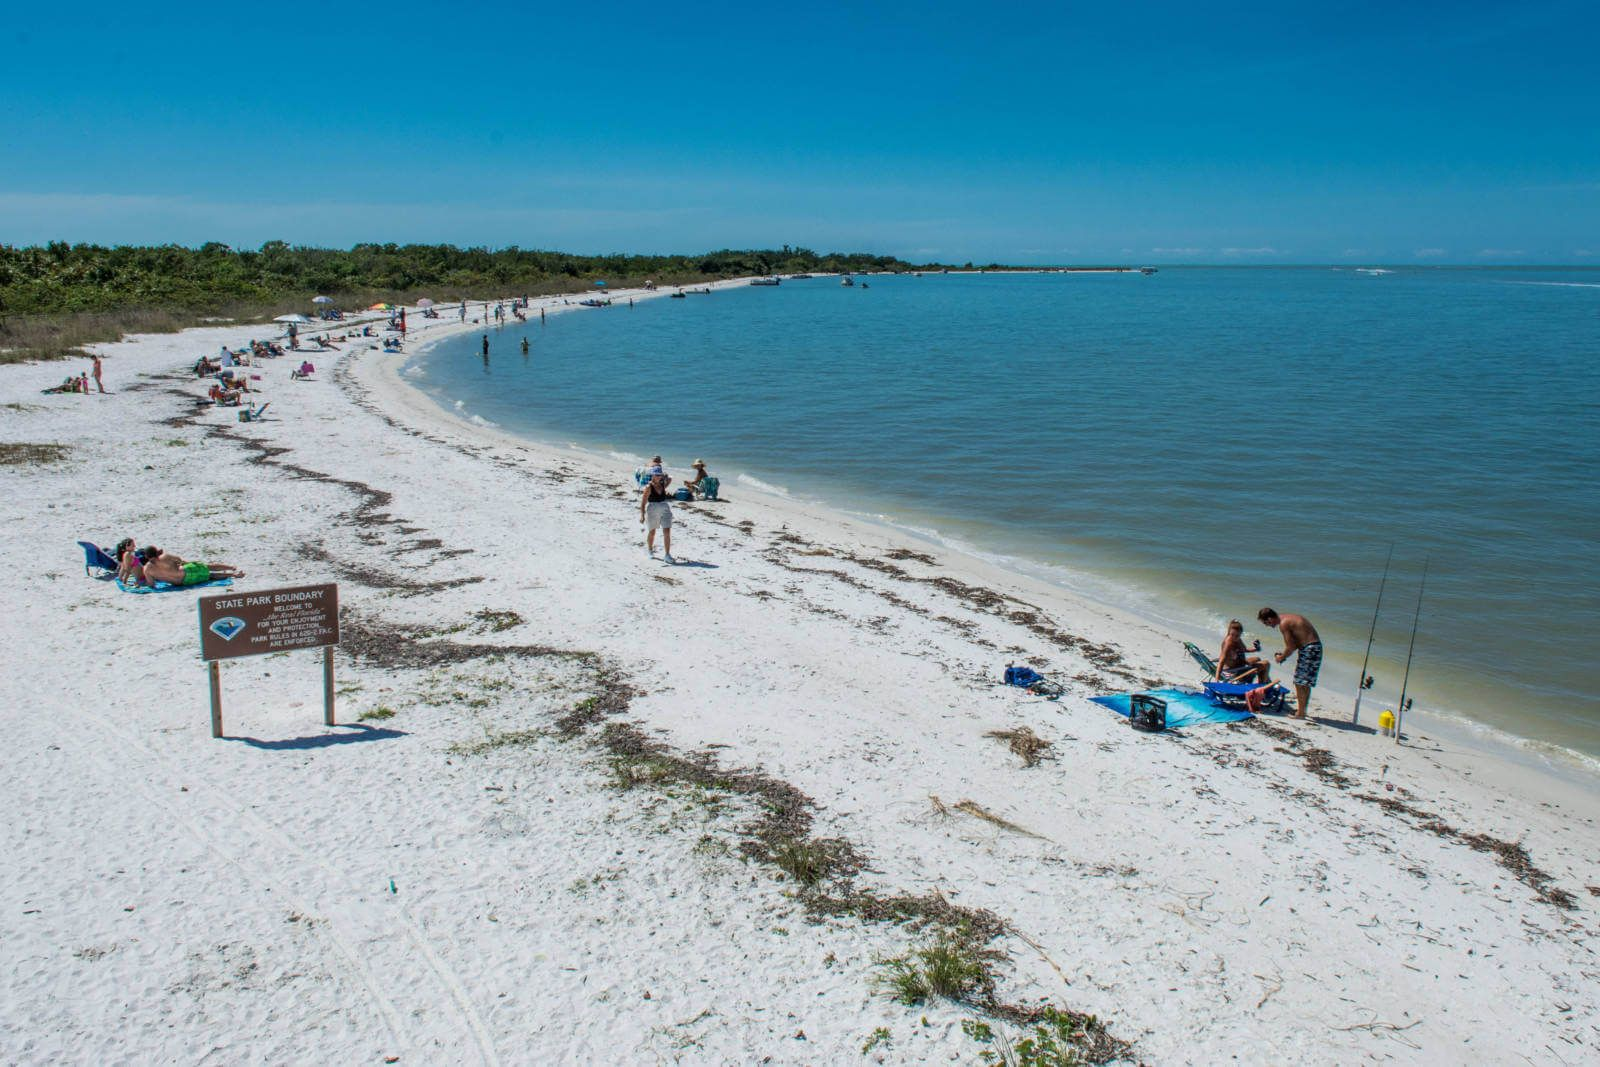 Zillow Barefoot Beach Bonita Springs Florida